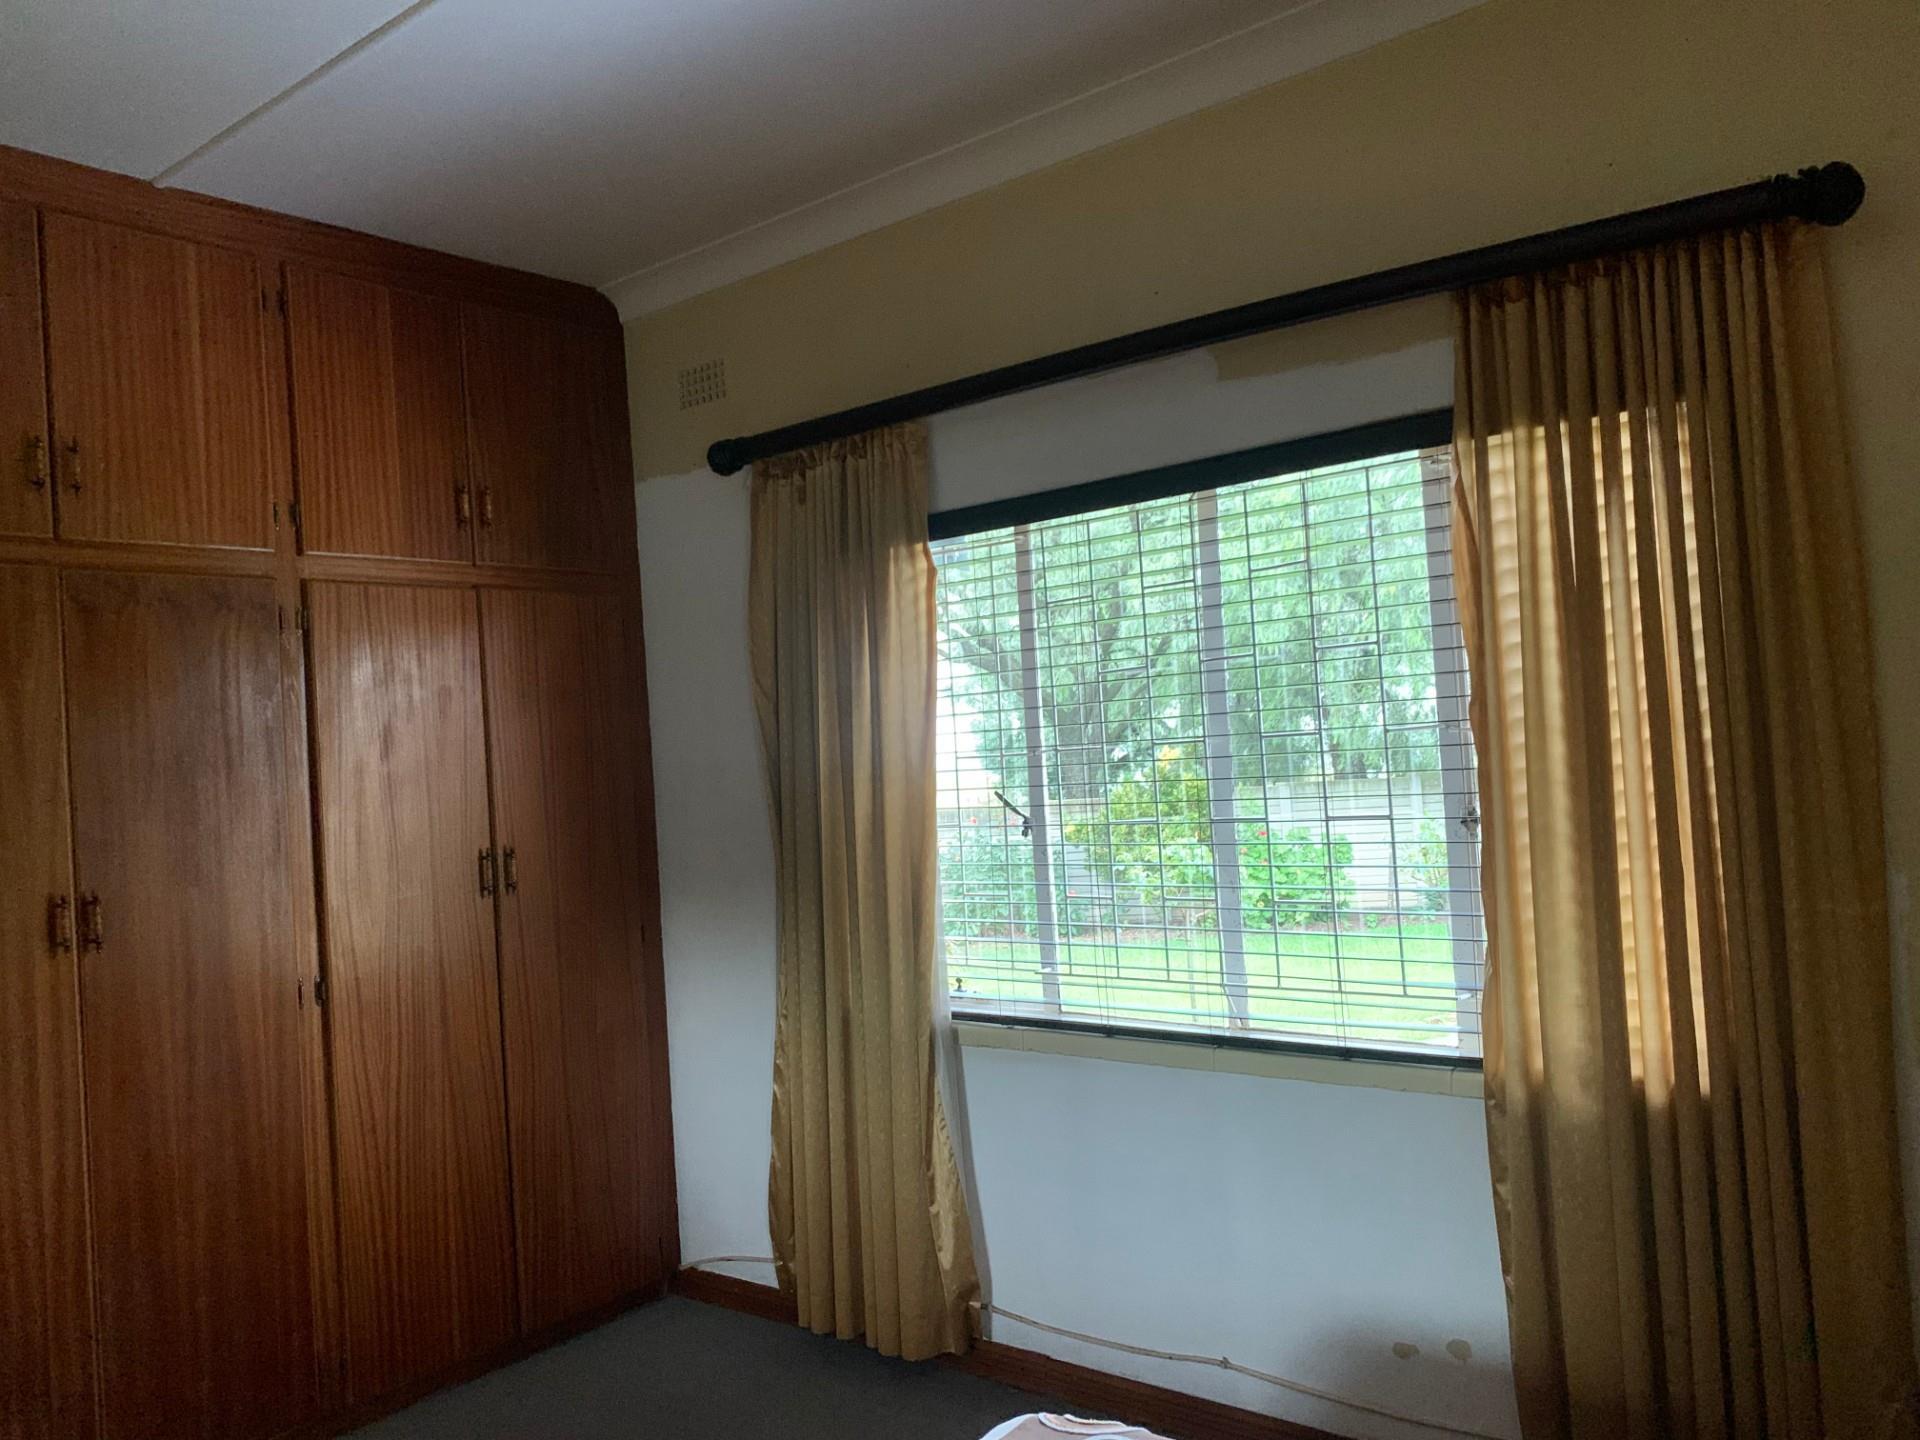 3 Bedroom House For Sale in Kinross